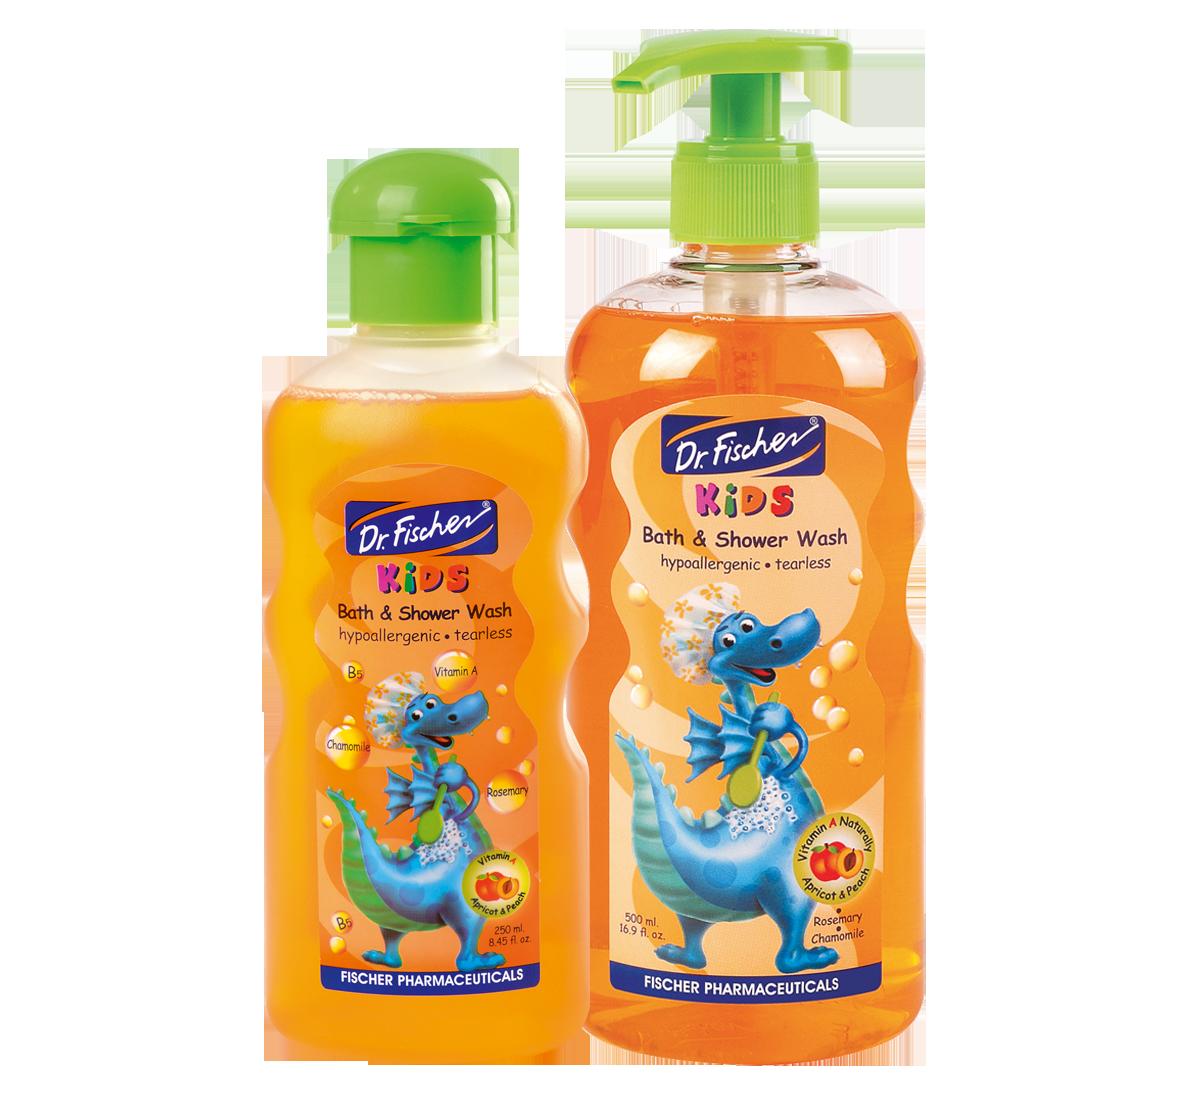 E_kids_bath_&_shower_1184x1104